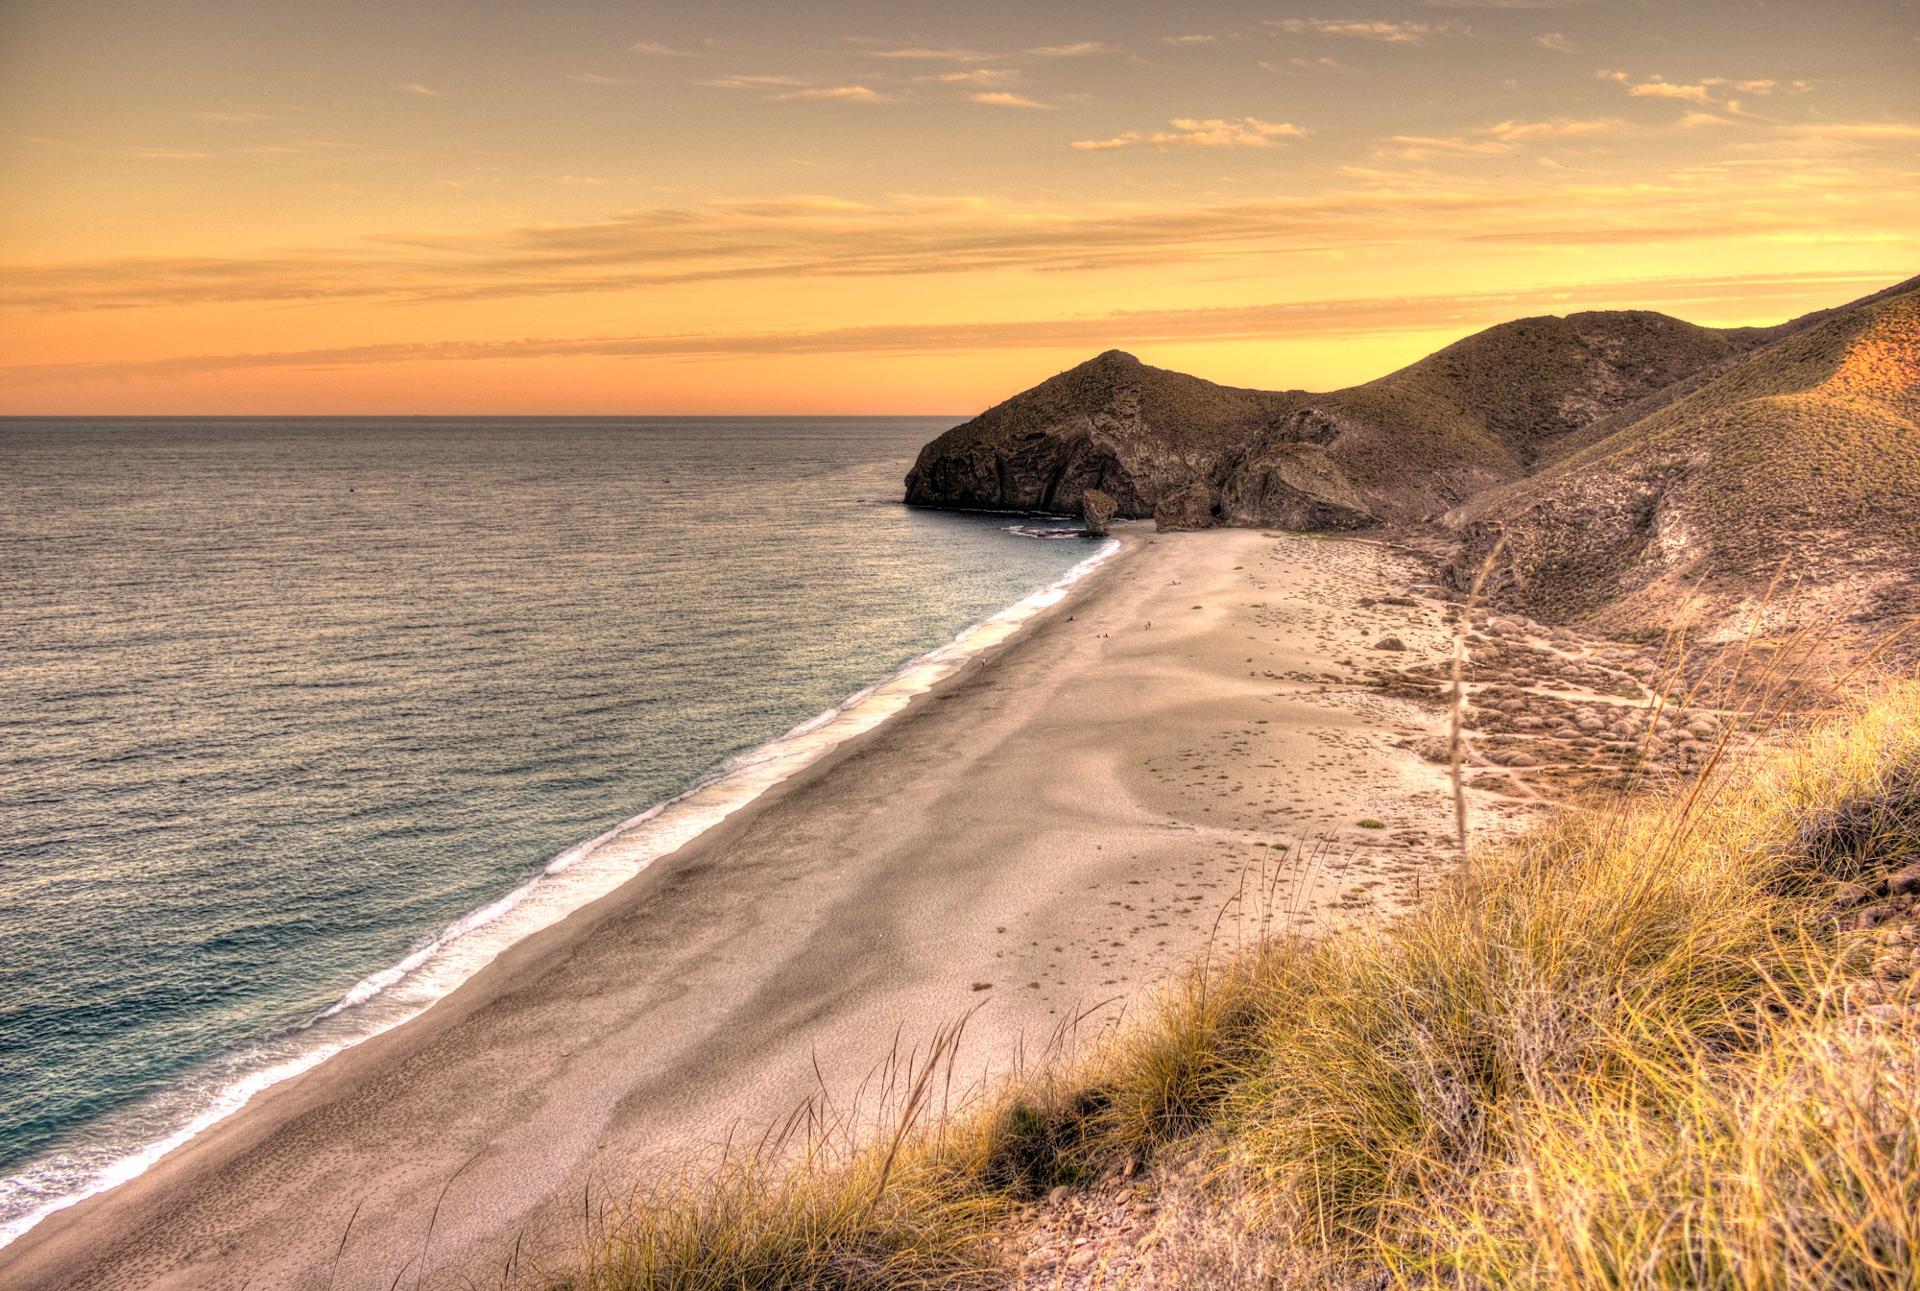 Sunset @ Cabo de Gata (SPAIN)